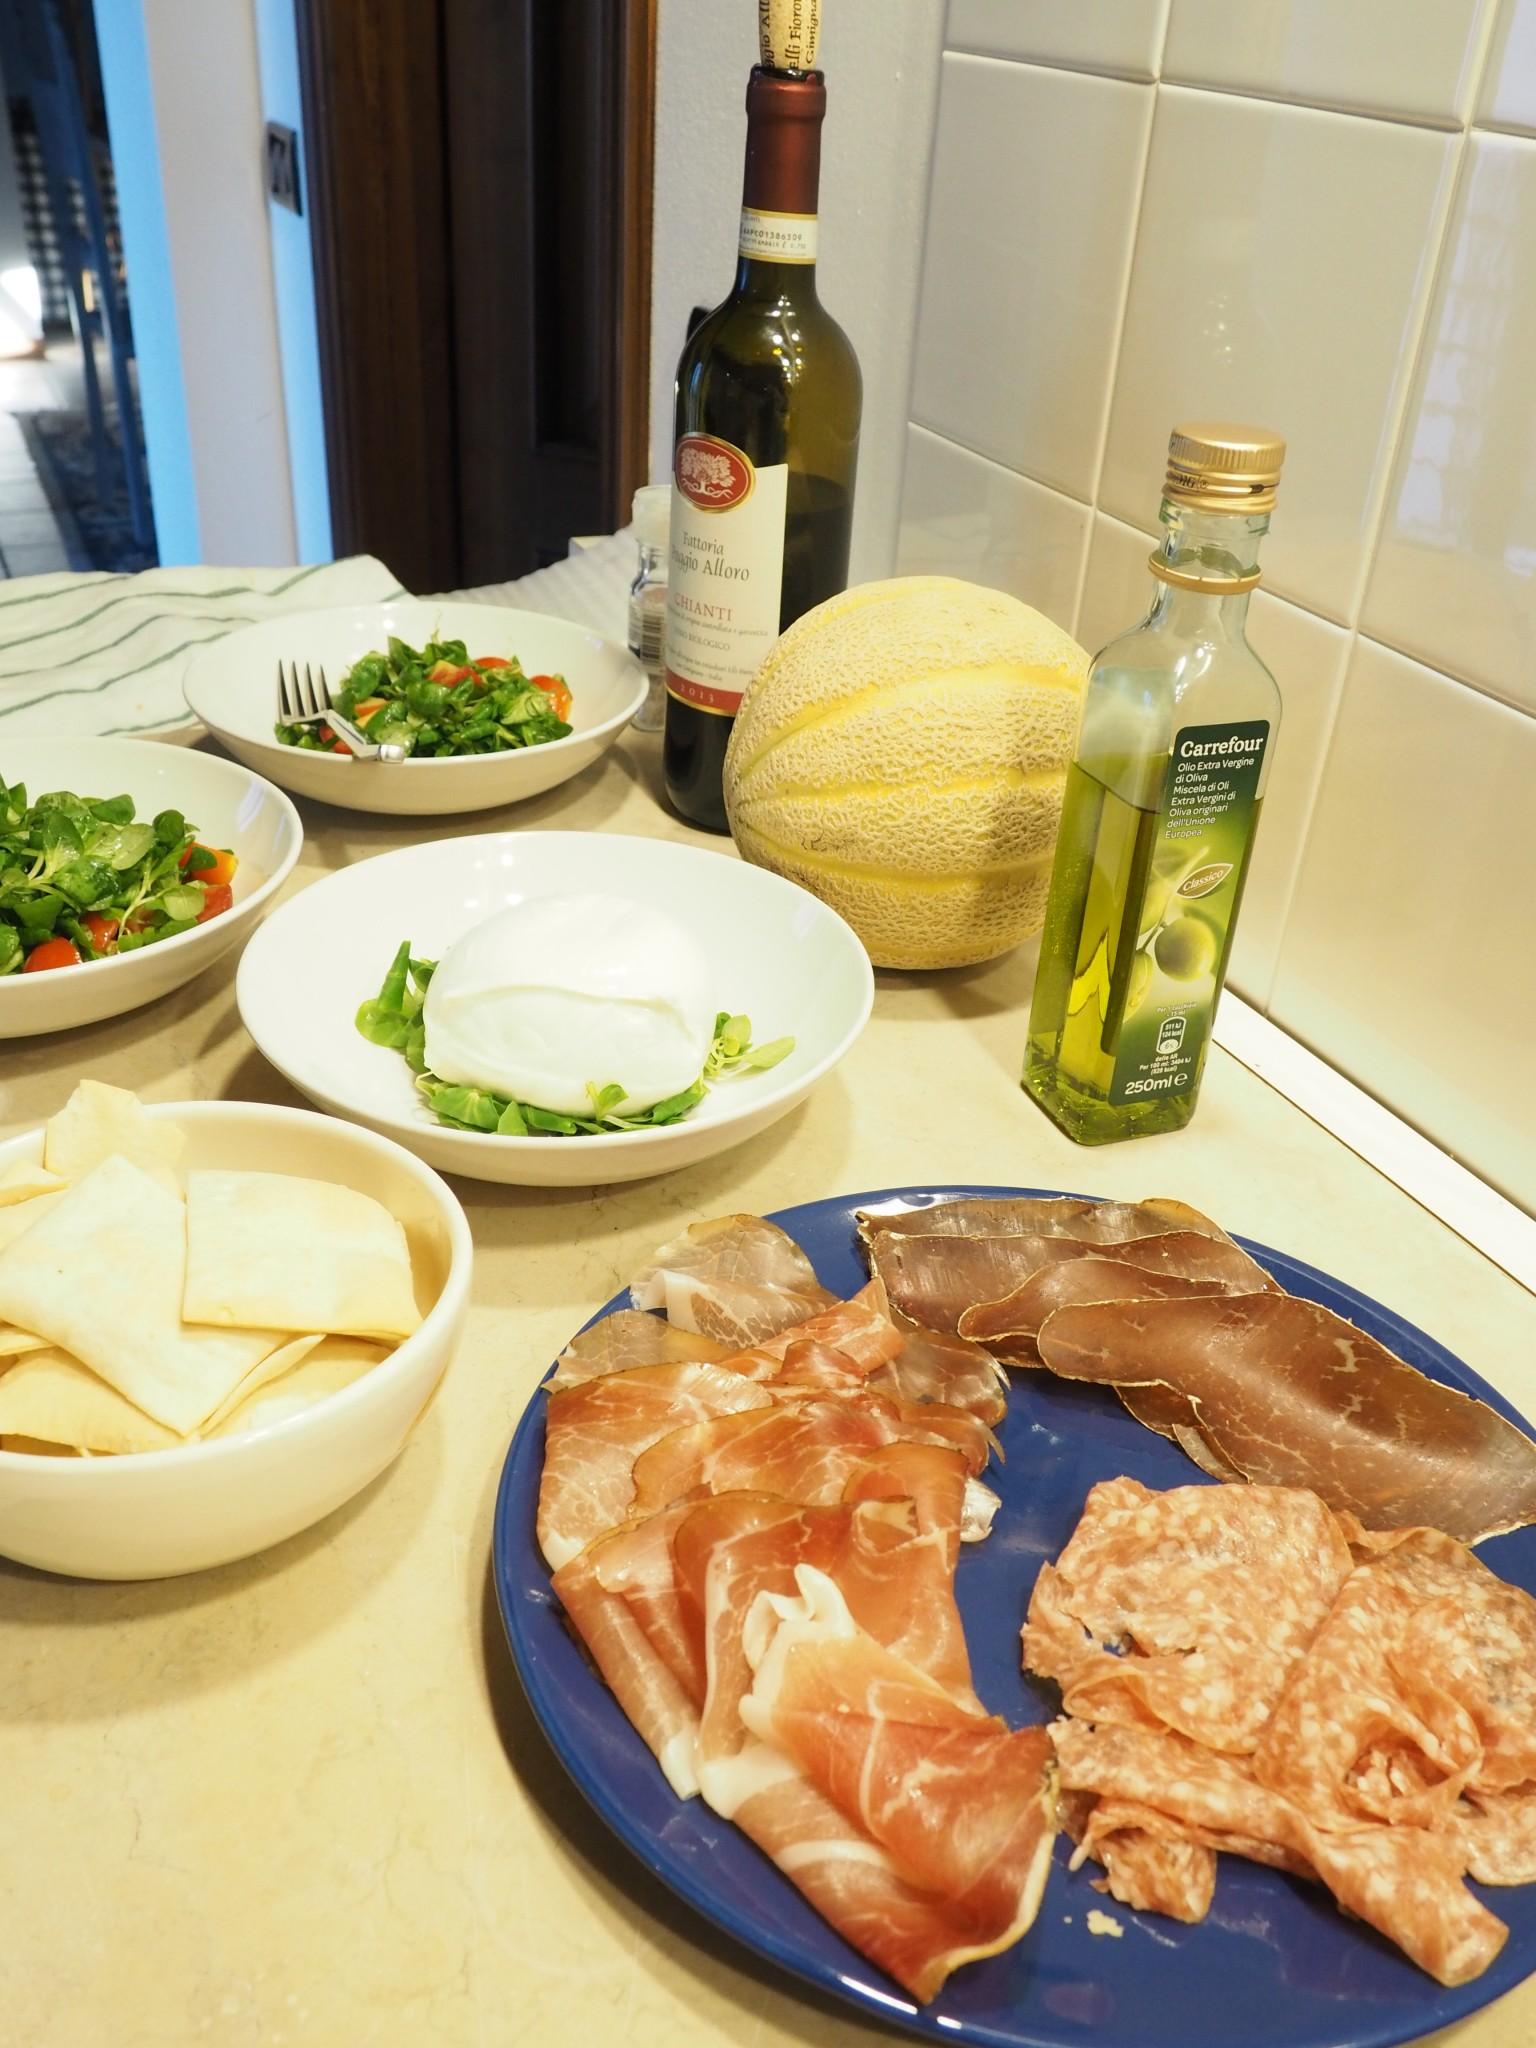 A Taste of Italy: Insalata Valerian